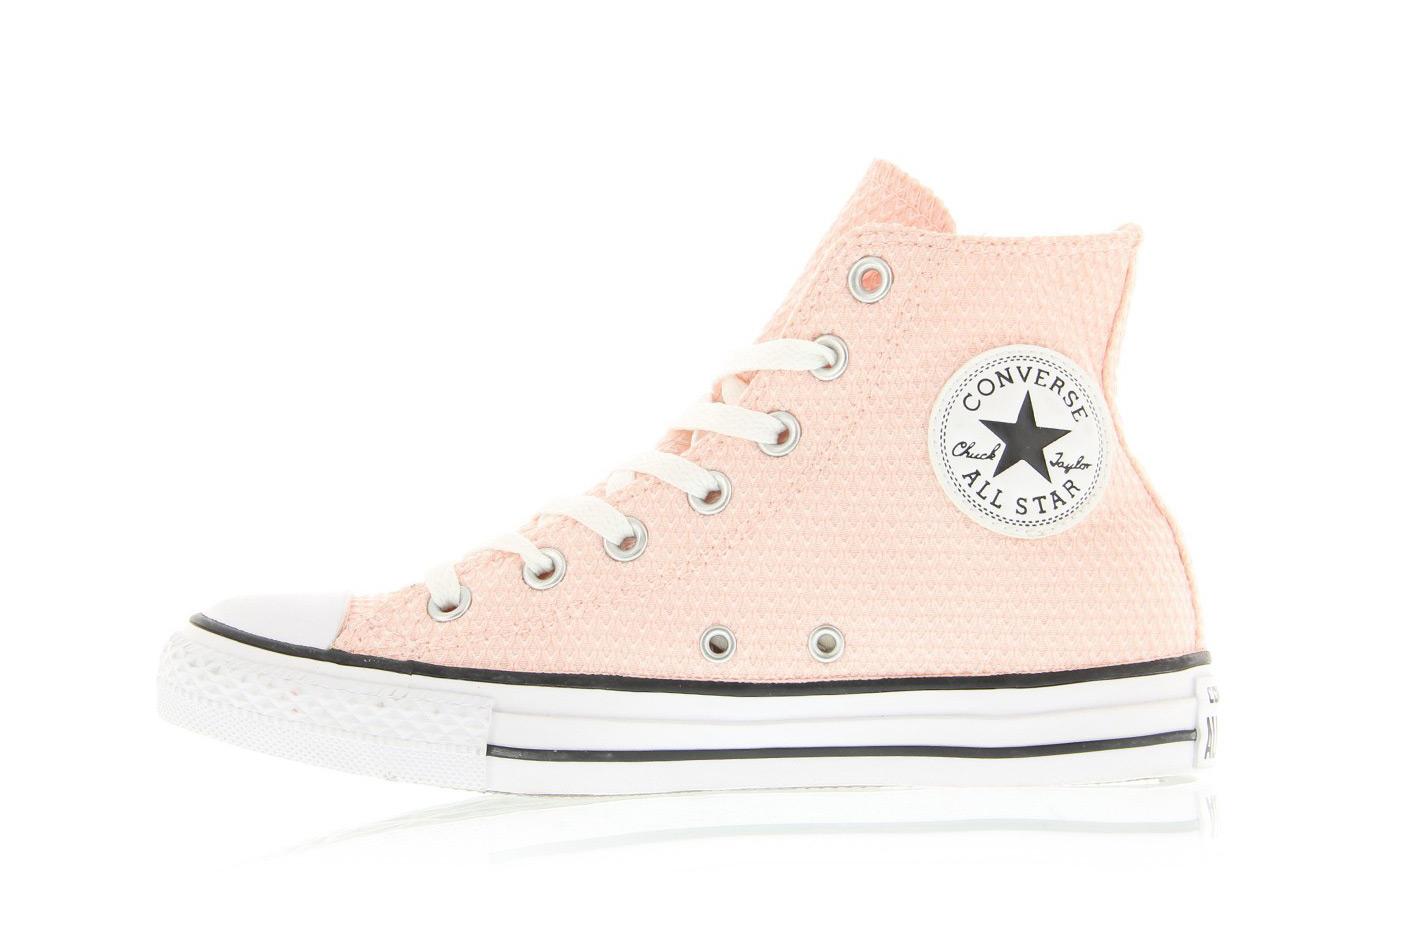 Converse Chuck Taylor All Star Gemma Pastel Pack - 100591